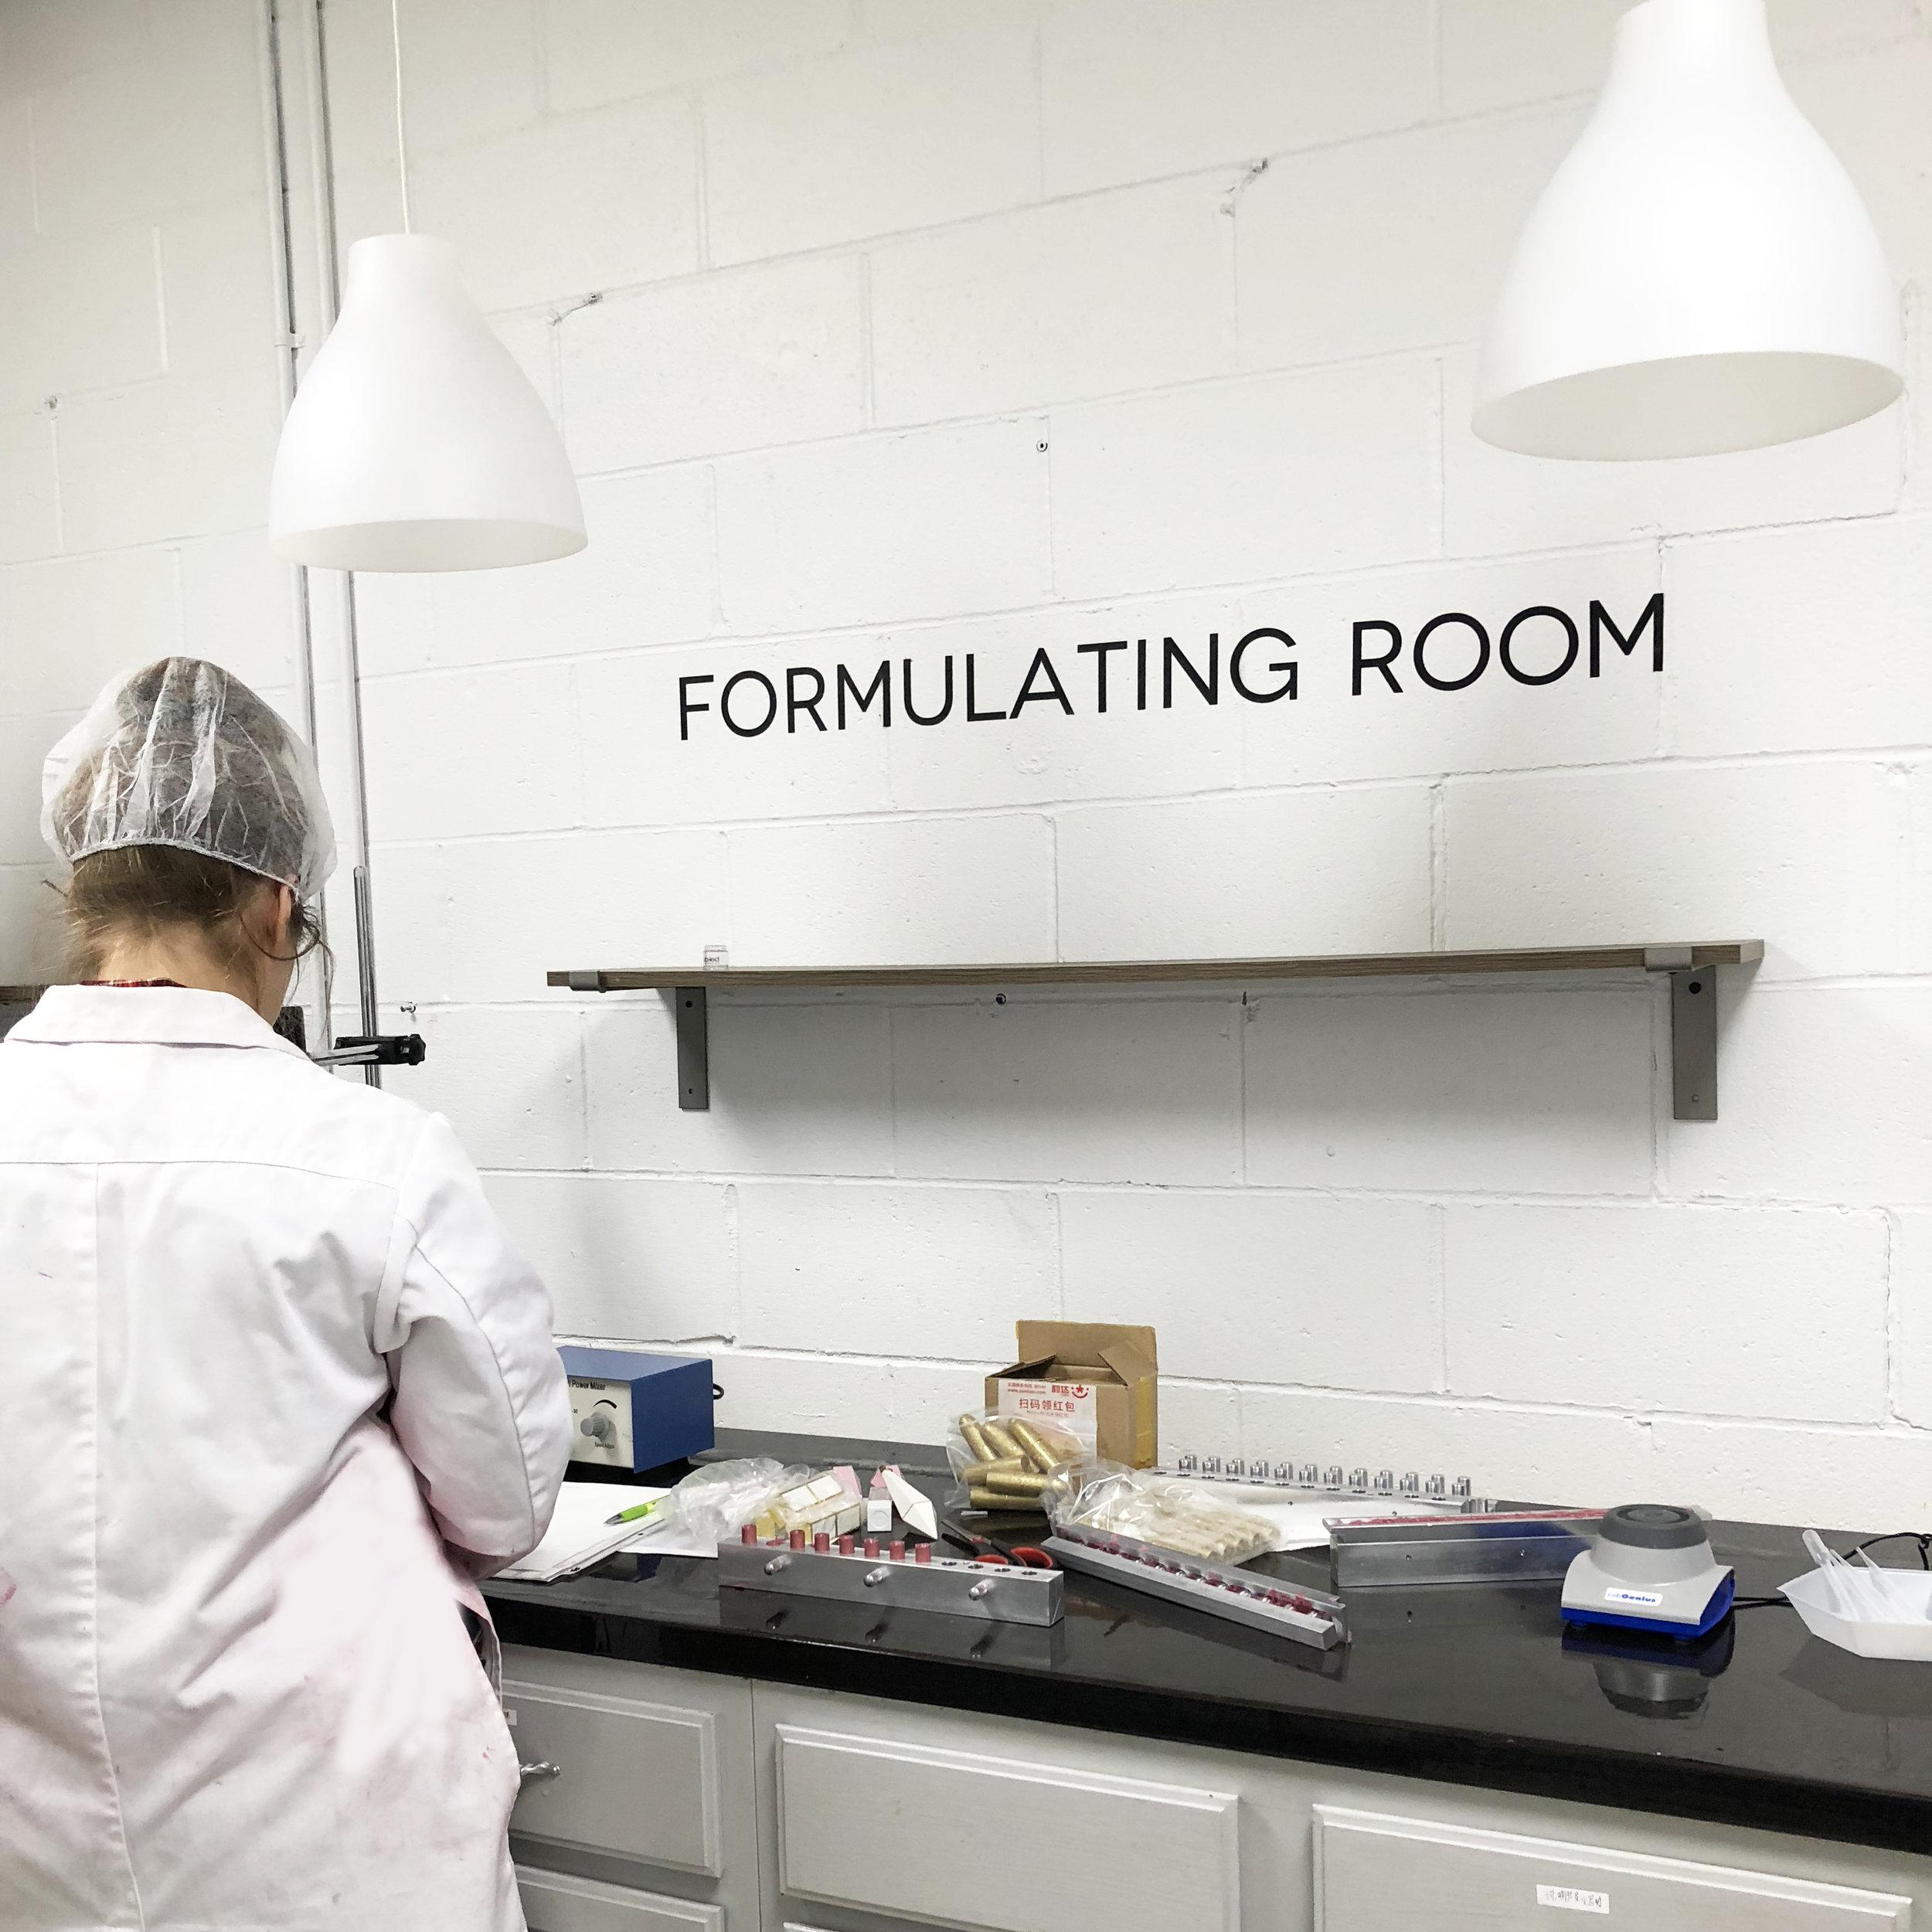 Abby in Formulating Room 1x1.jpg